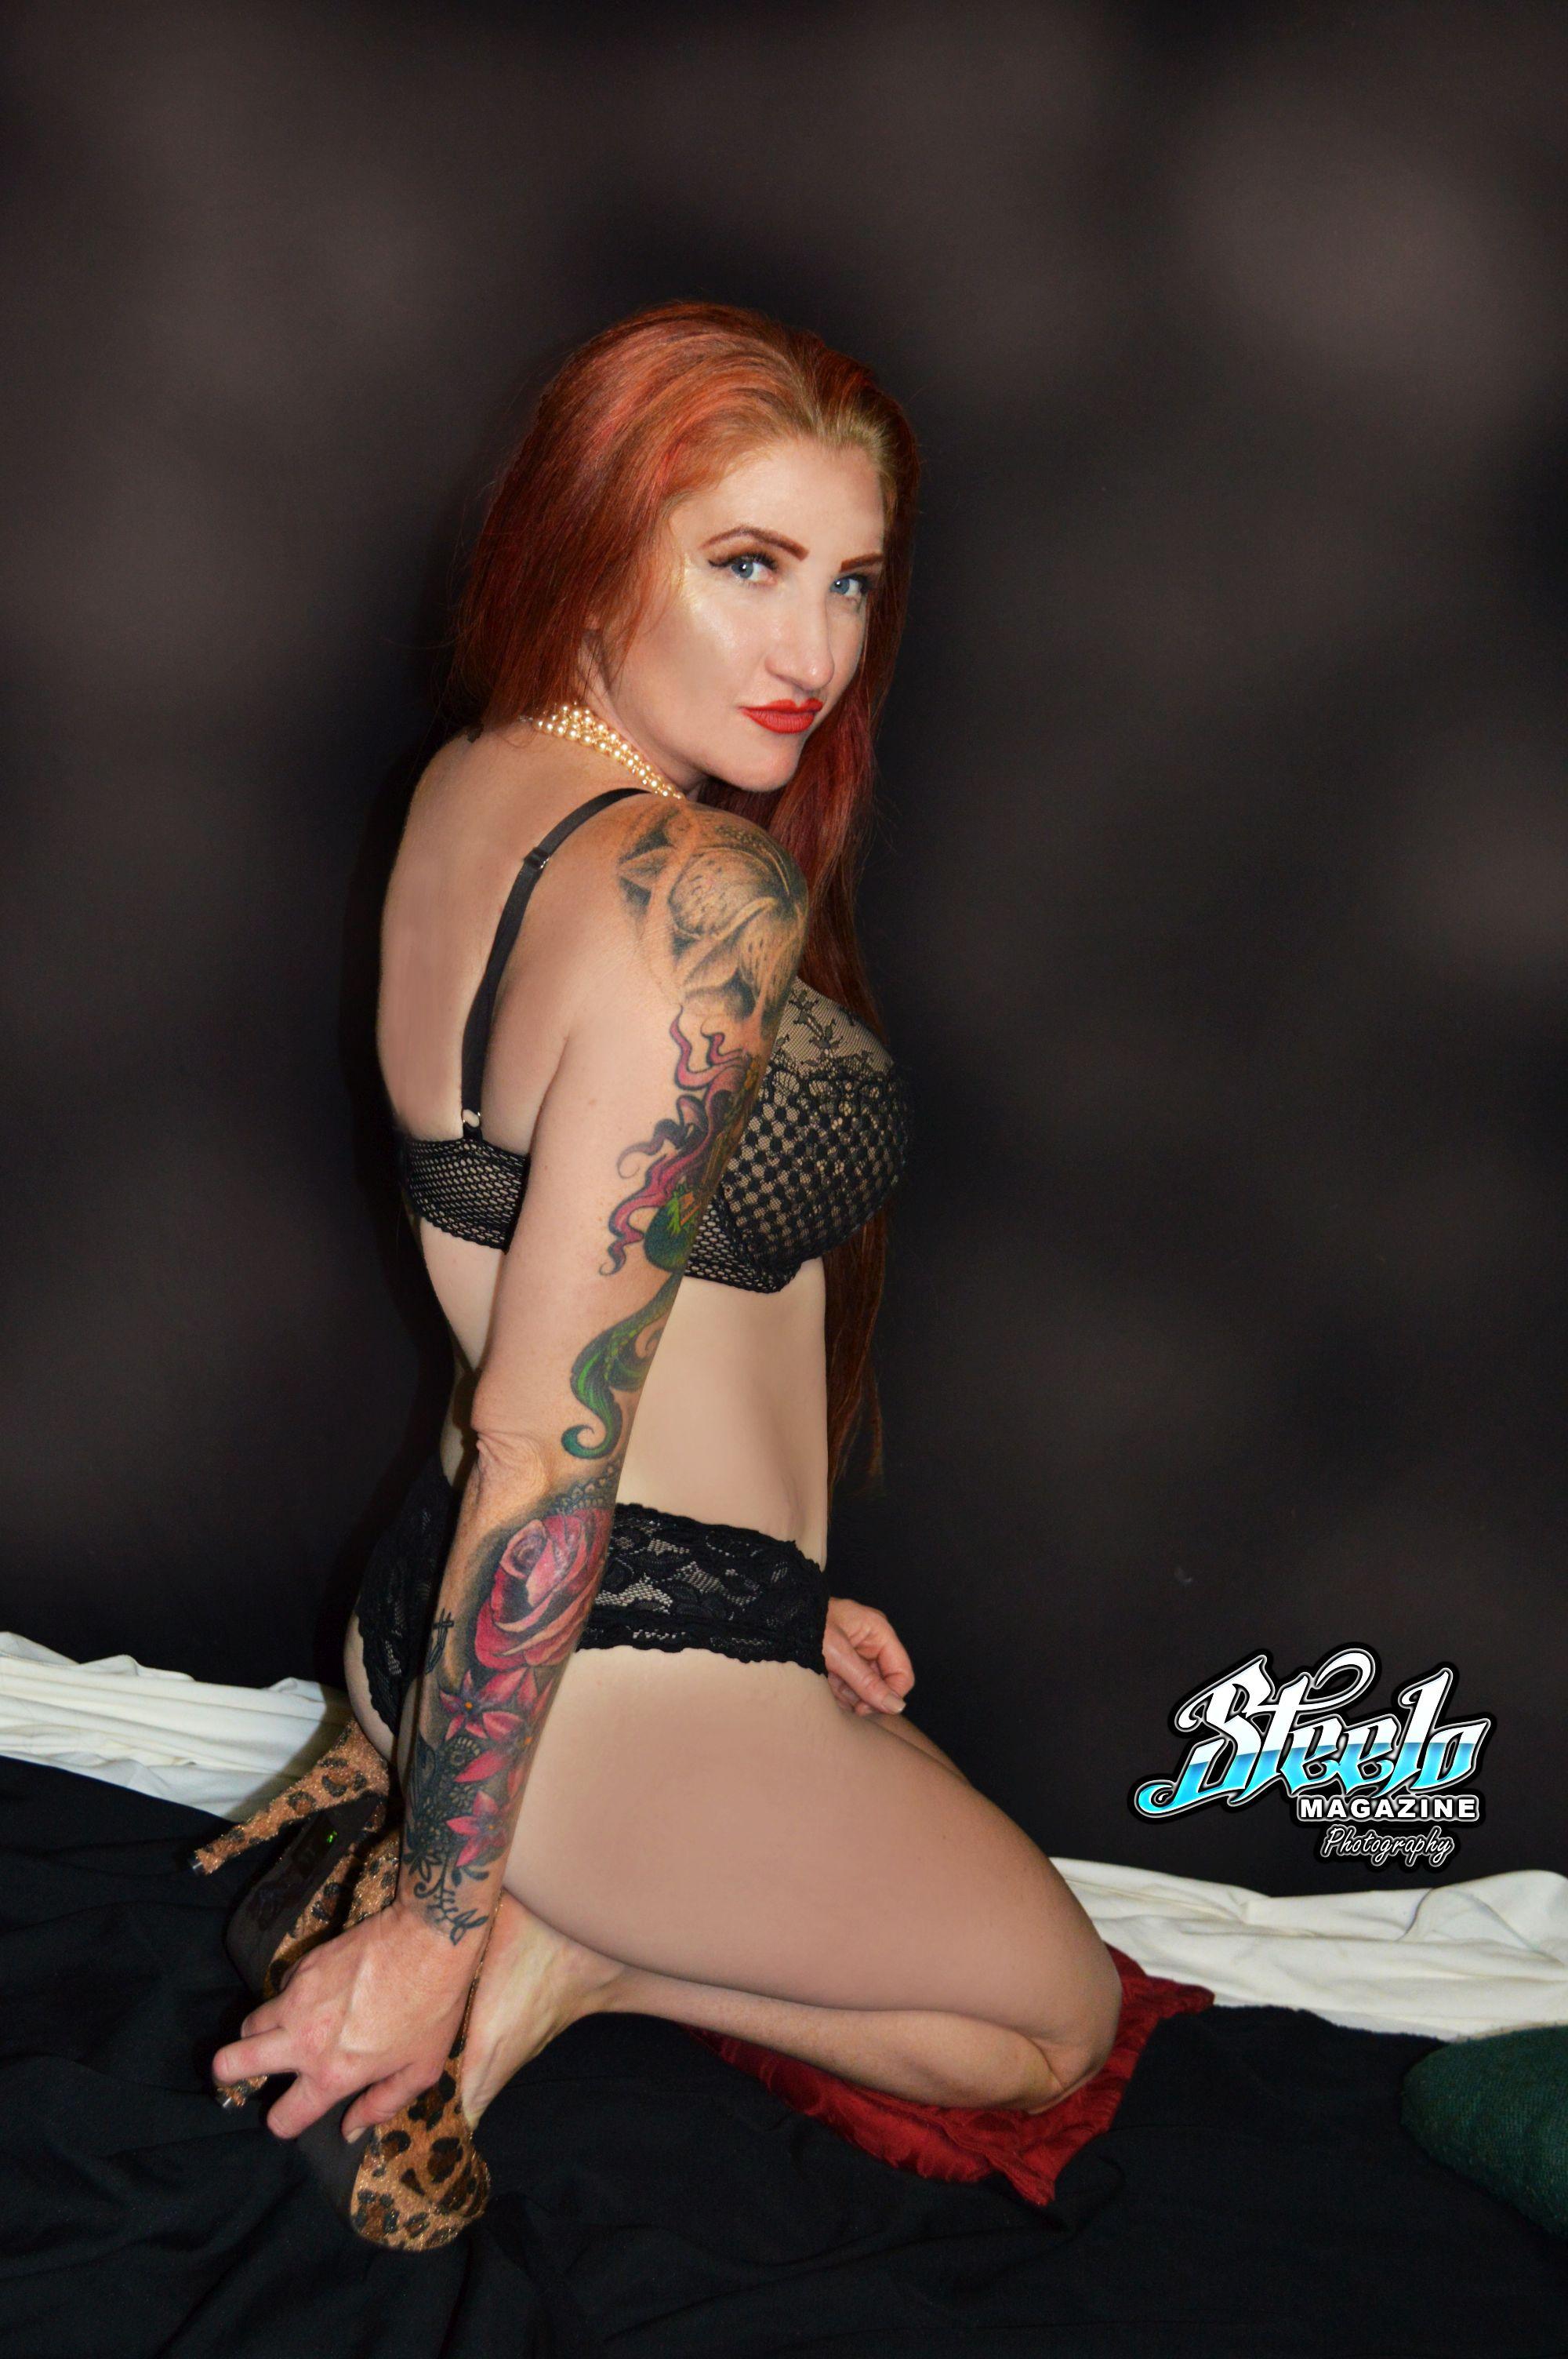 Creena 1st sexy photo shoot (307)